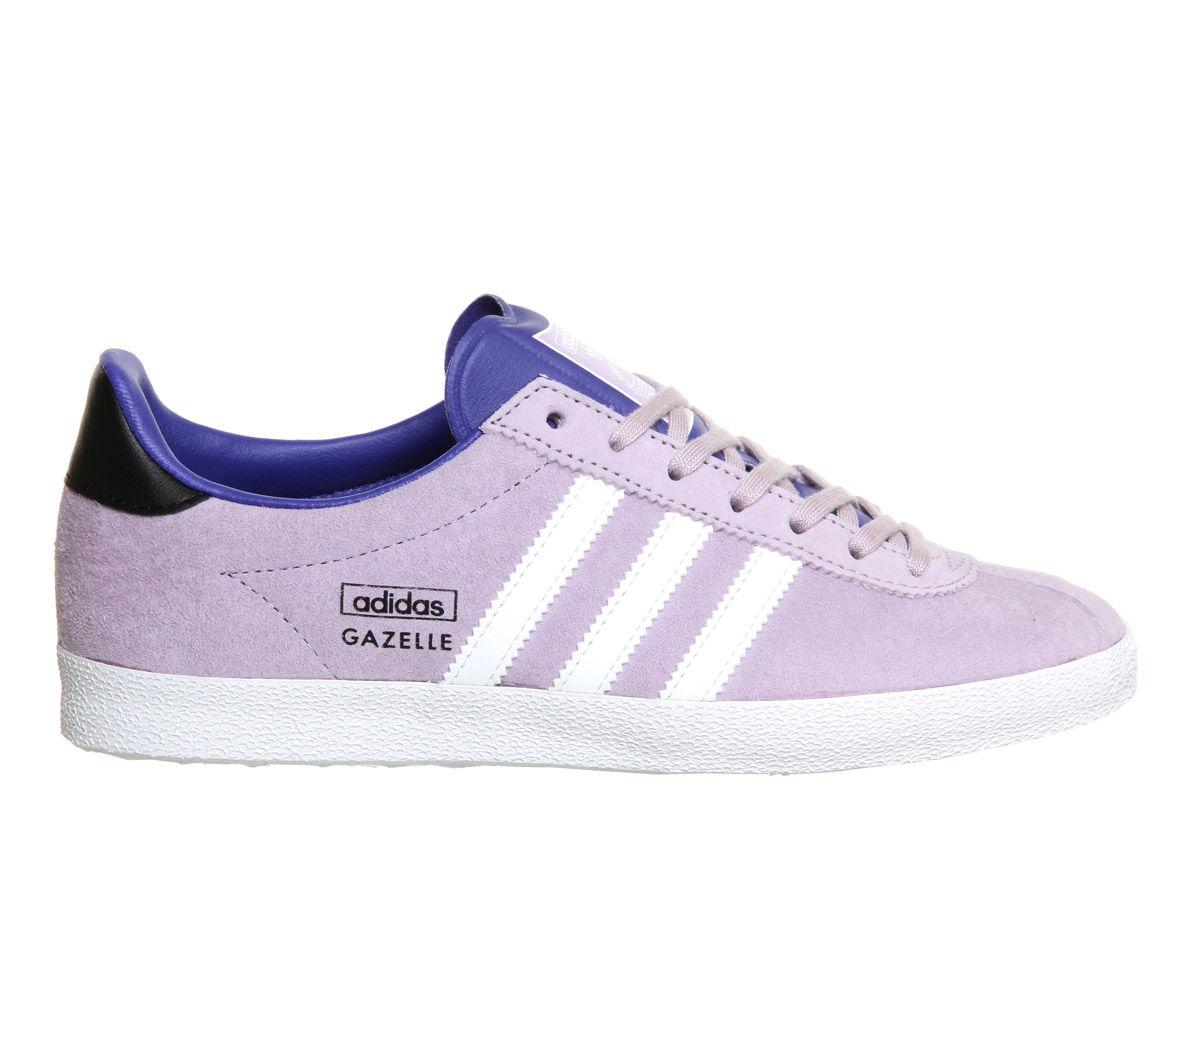 Adidas Gazelle Og W Bliss Lilla Night Hers Flash Hers Night trainers Sko 2d2786